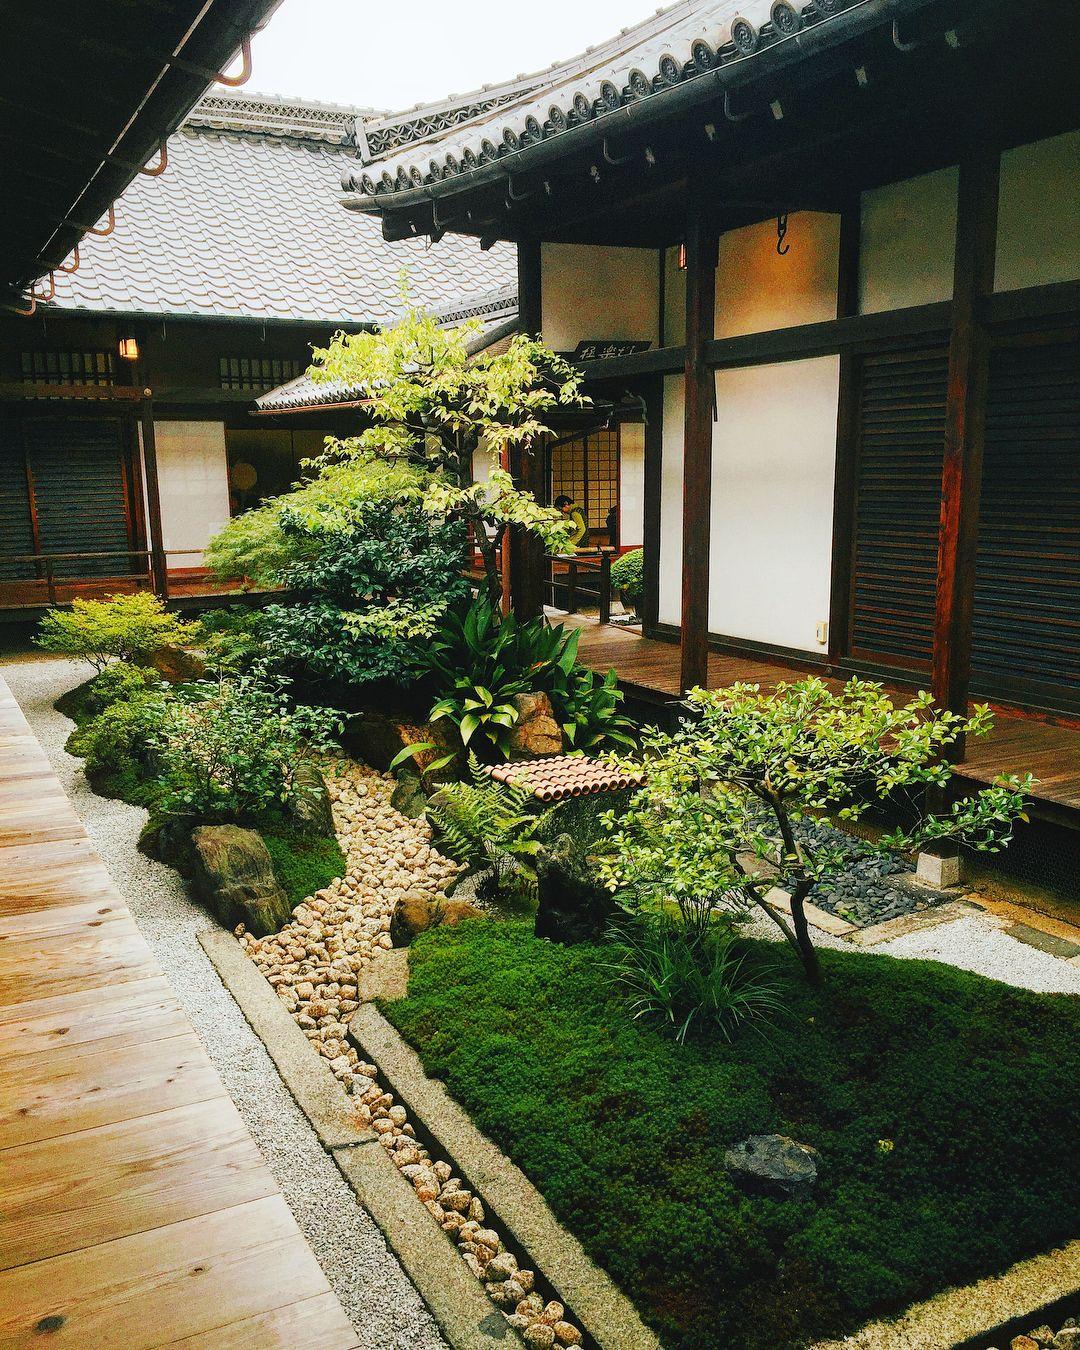 Japanese Garden Indoor: Pin By U.L.A. On Japanese Garden